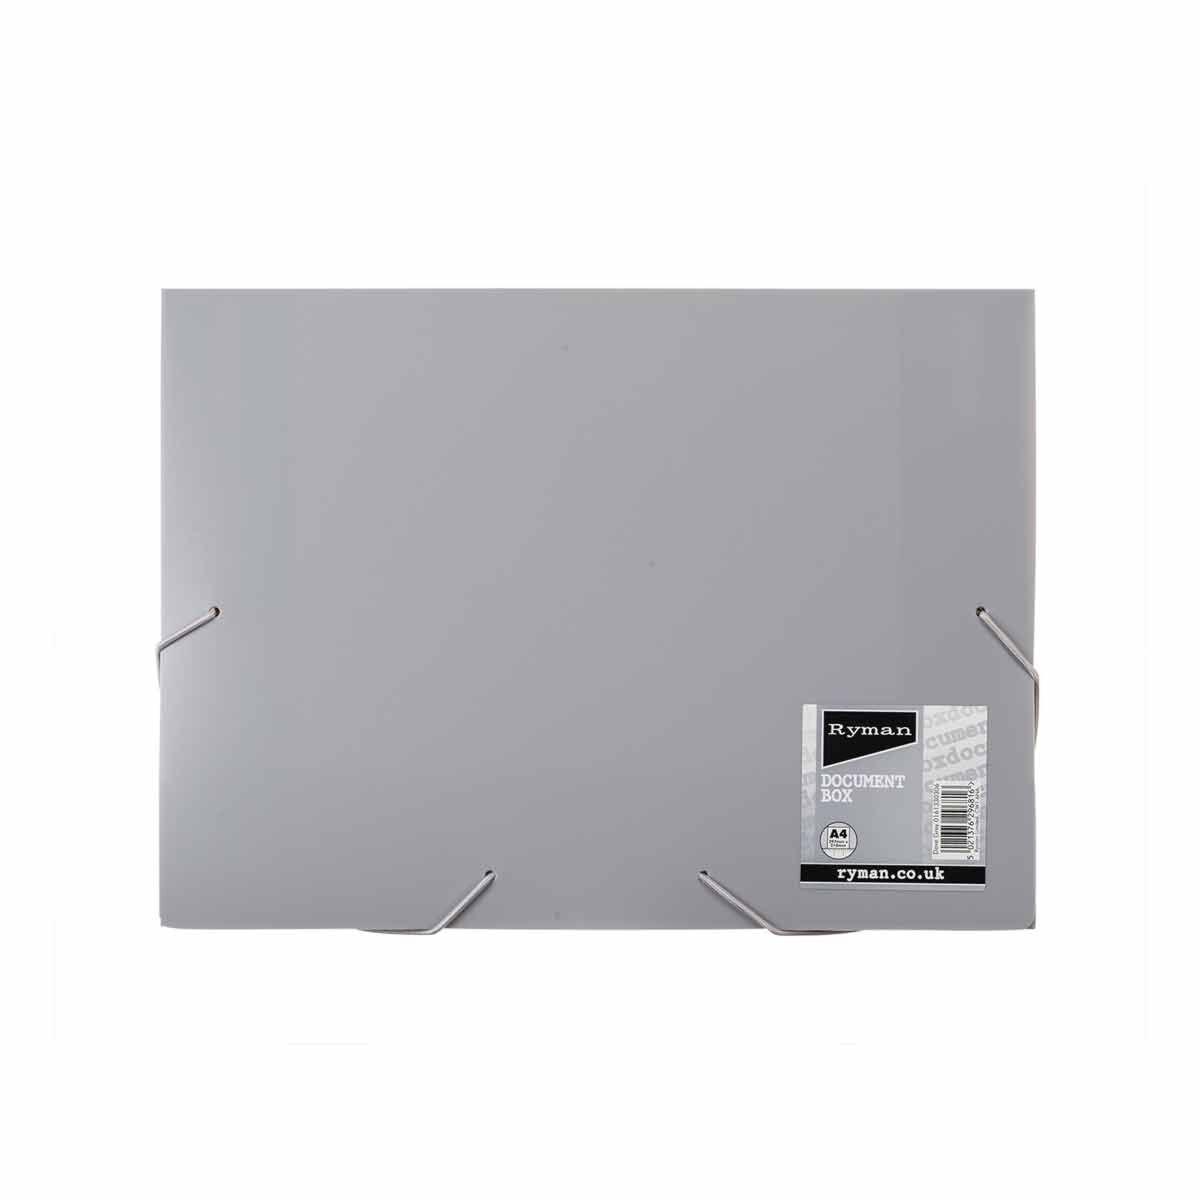 Ryman Pastel Document Box A4 Dove Grey